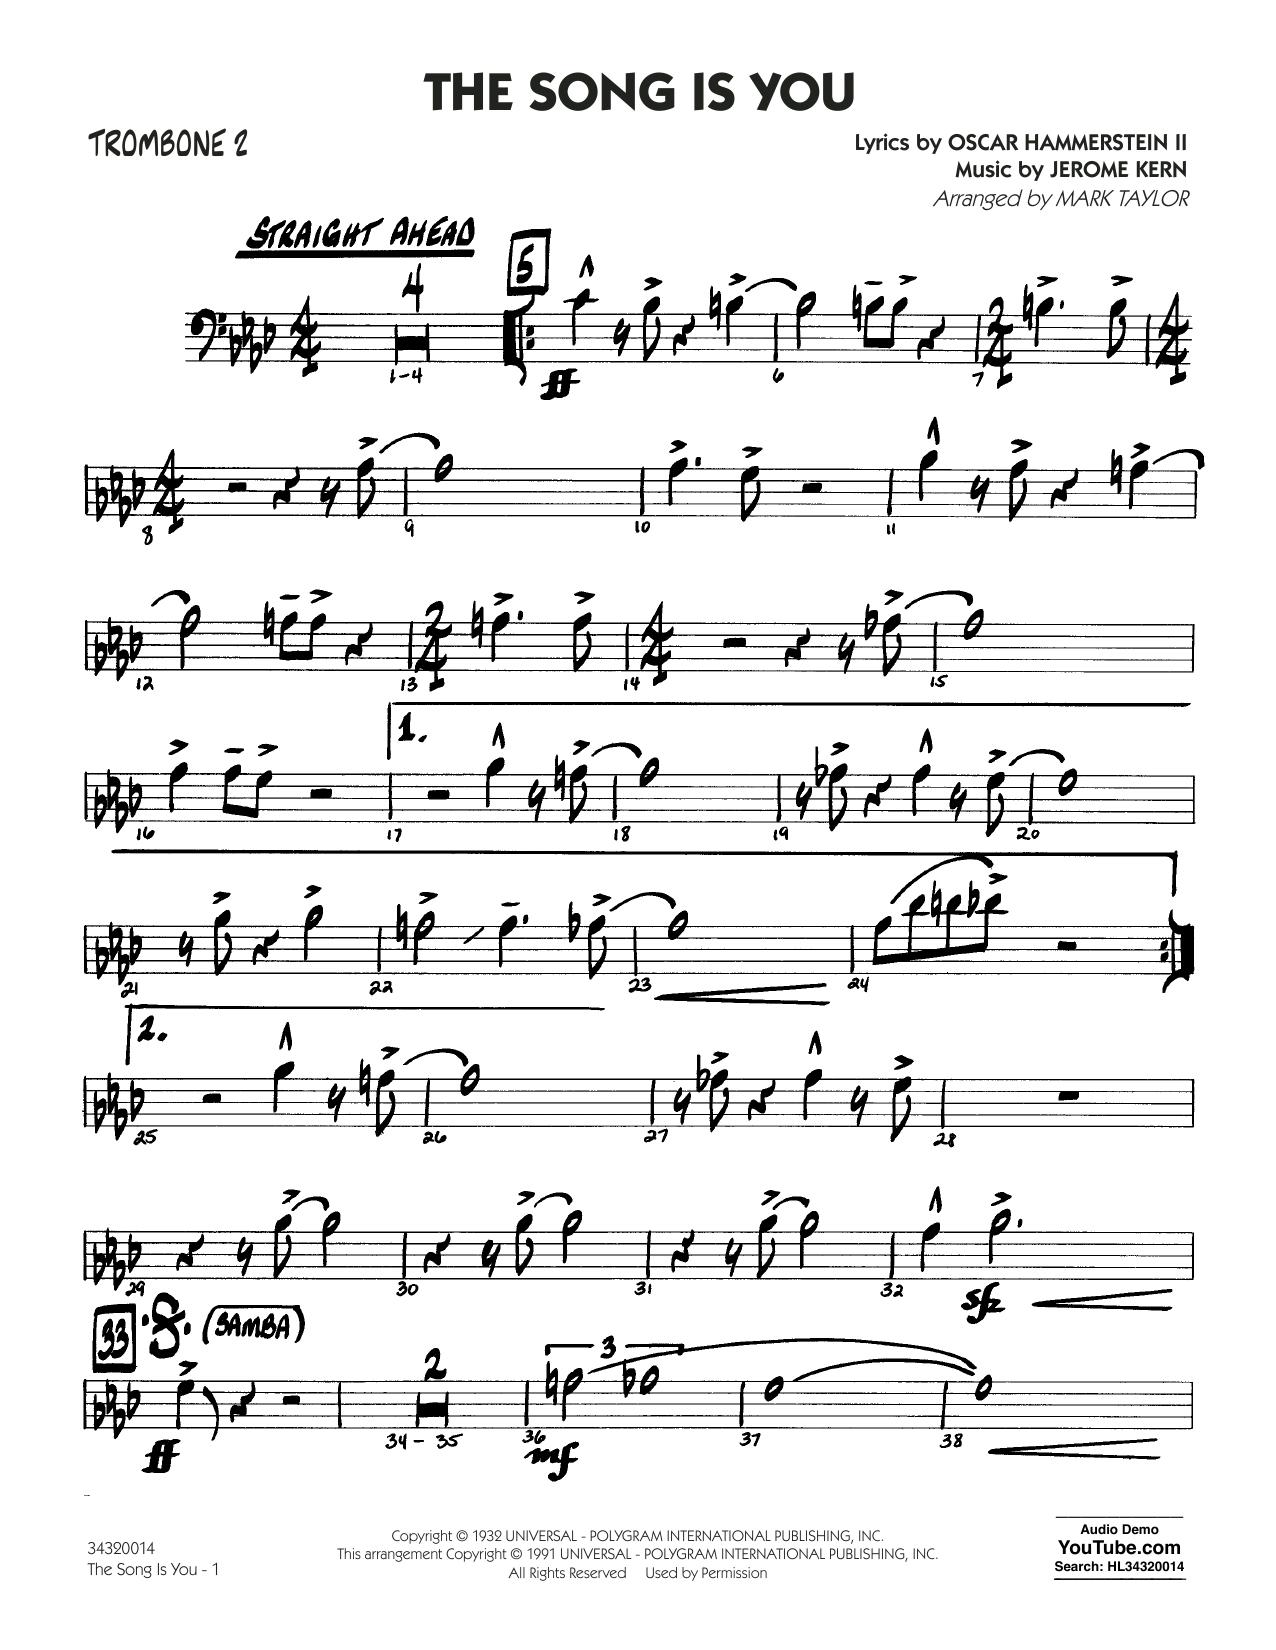 Oscar Hammerstein II - The Song Is You - Trombone 2